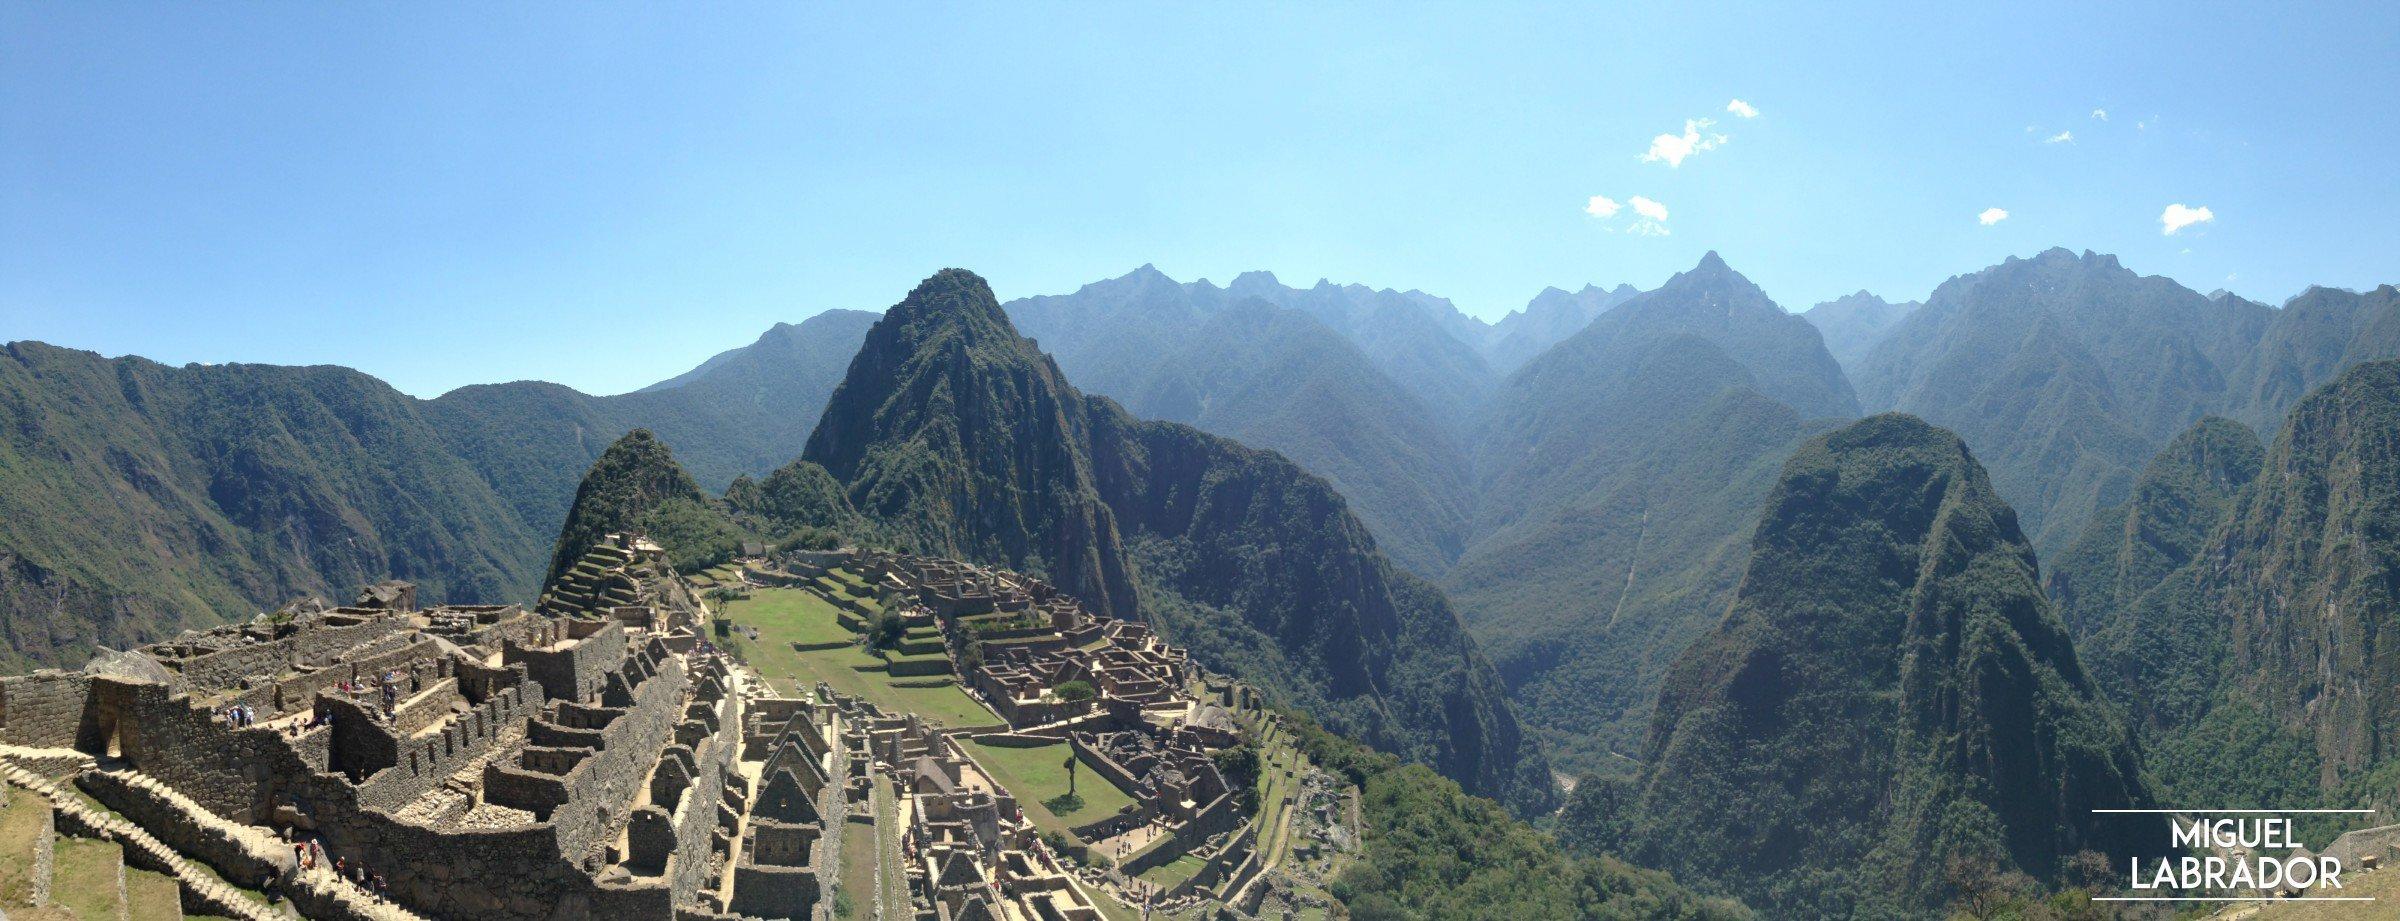 Panorámica Machu Picchu, foto de Miguel Labrador